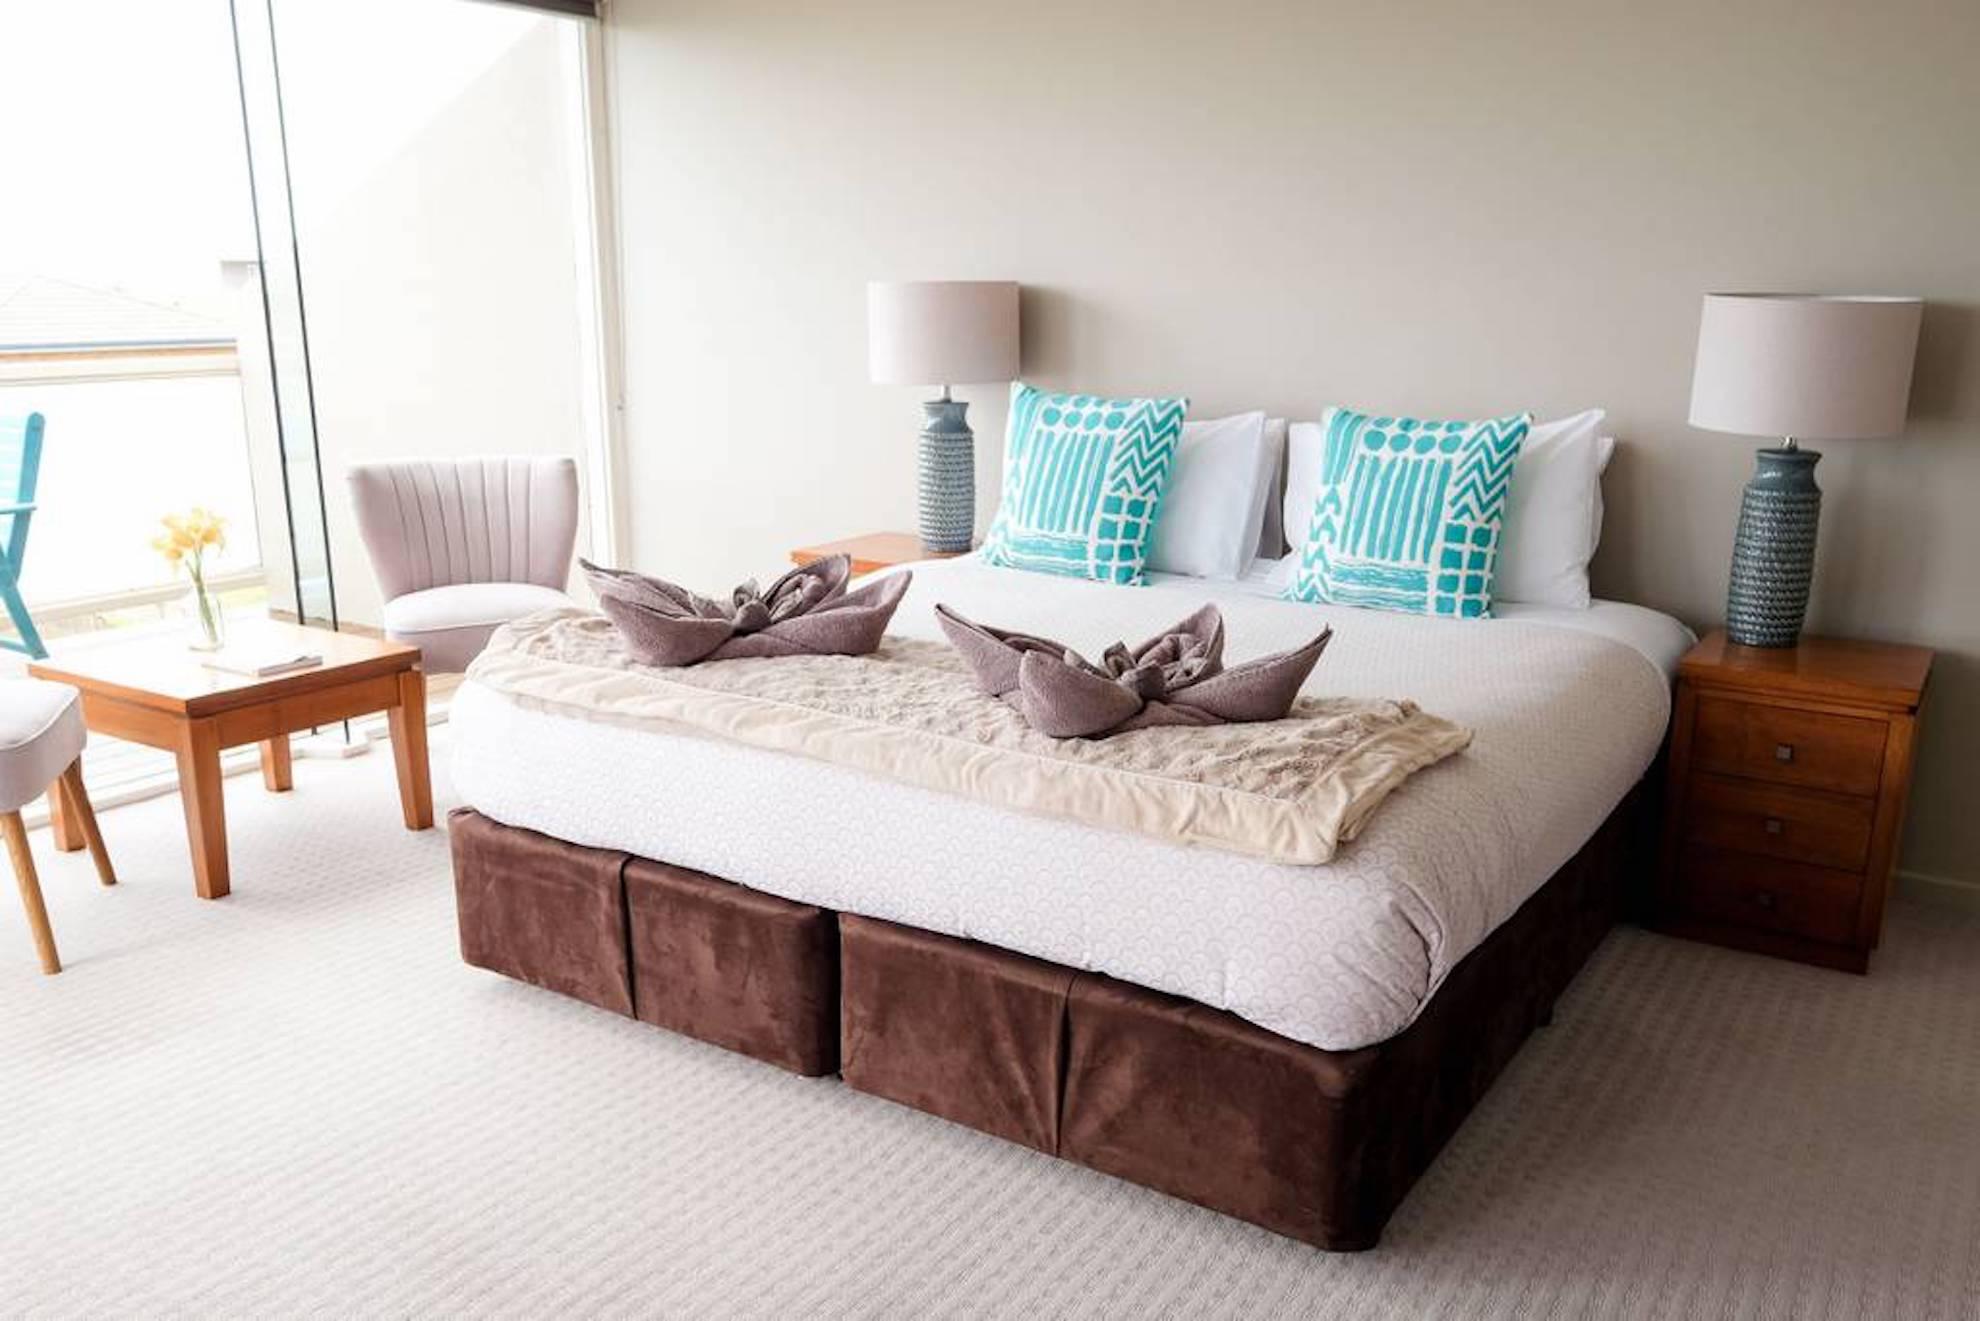 Whitesbeach Guesthouse Torquay Bedroom